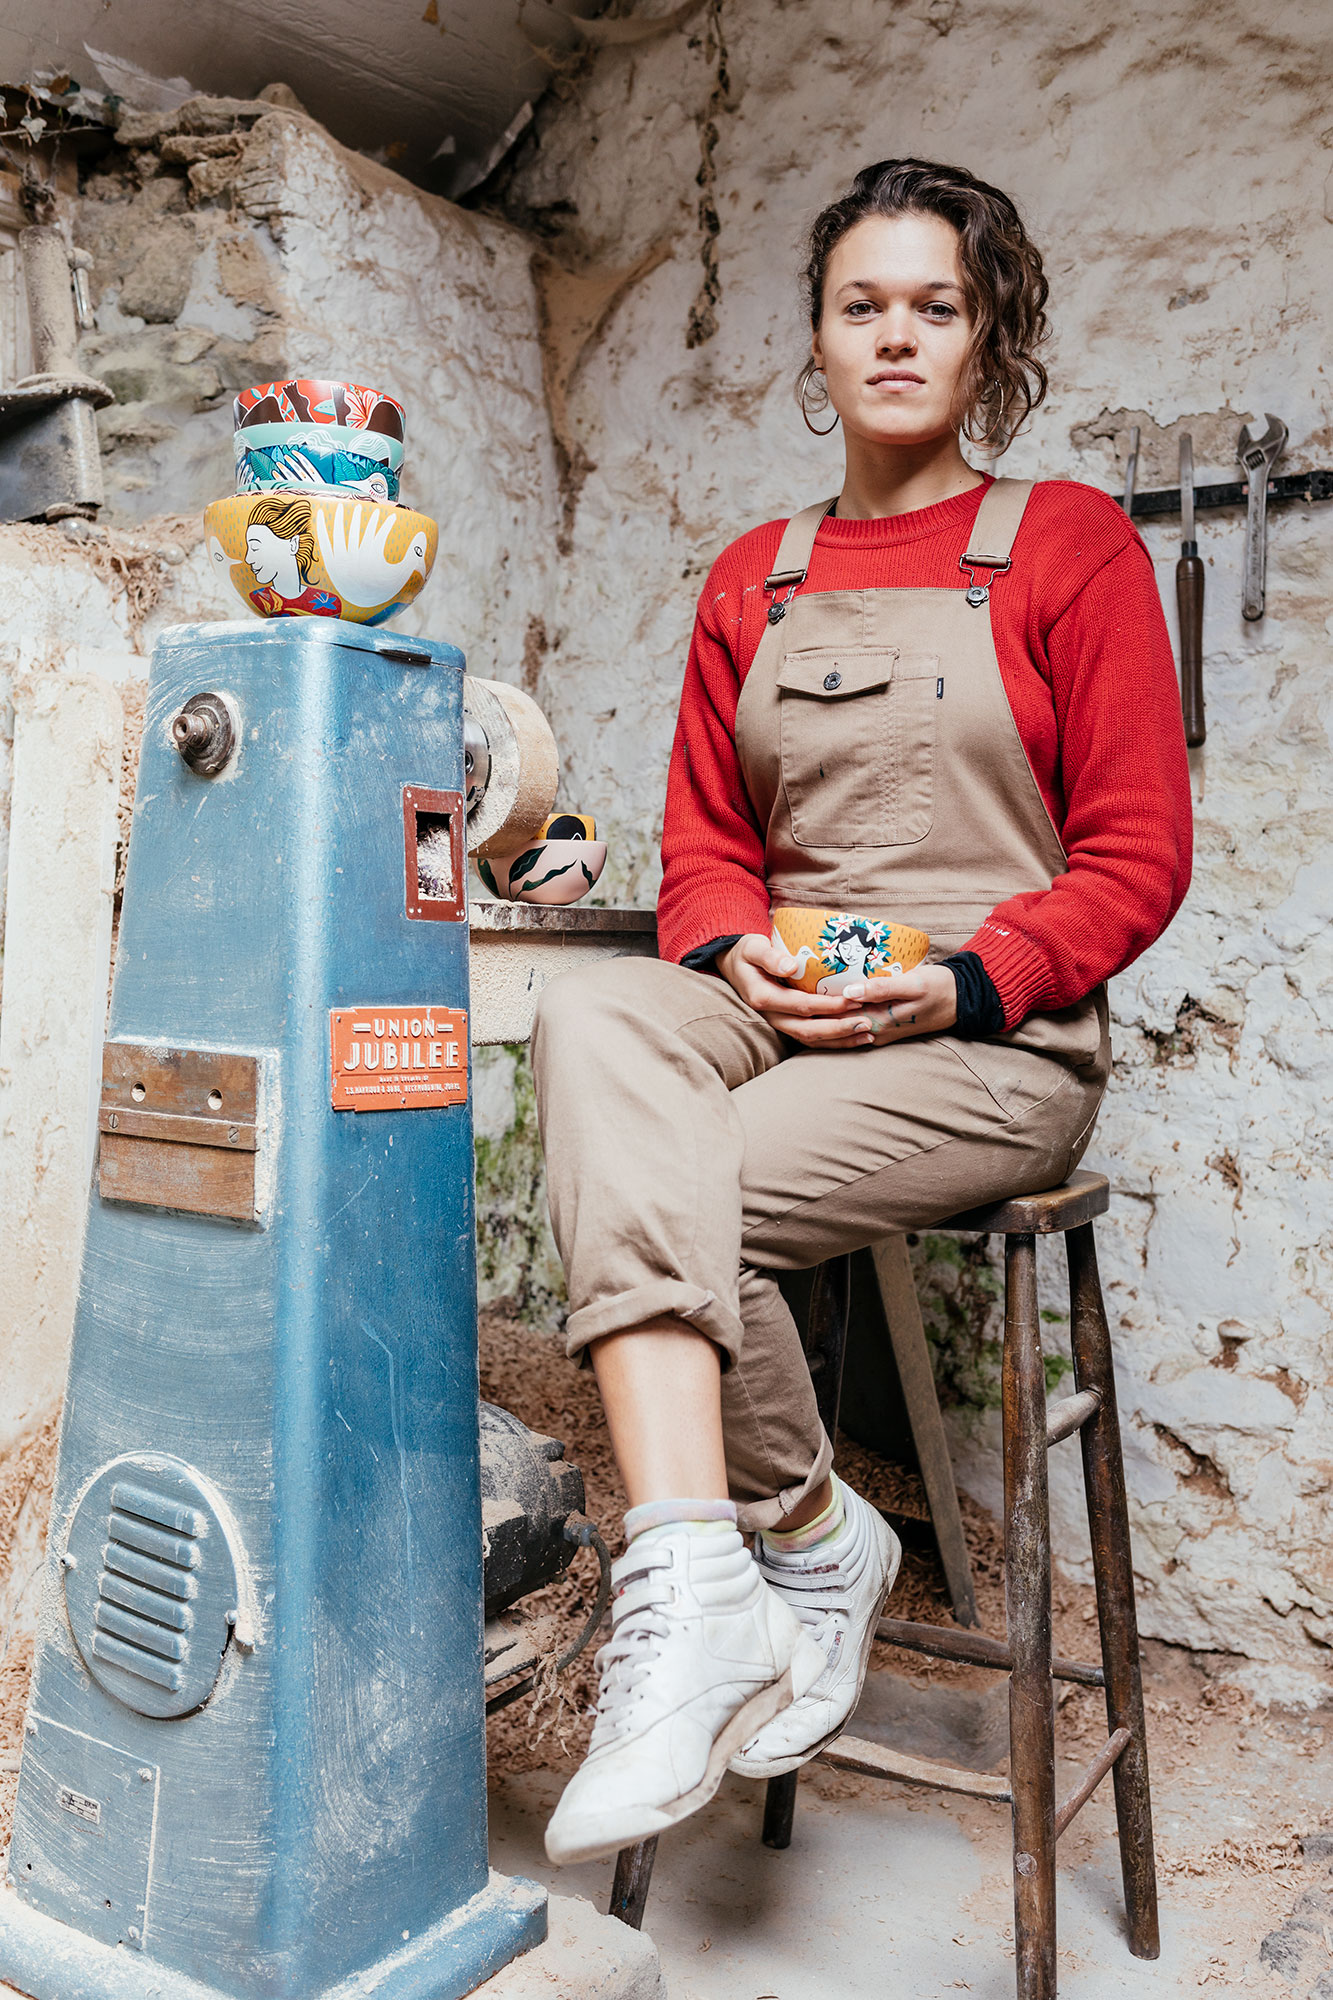 Amy Isles Freeman, Artist/Maker